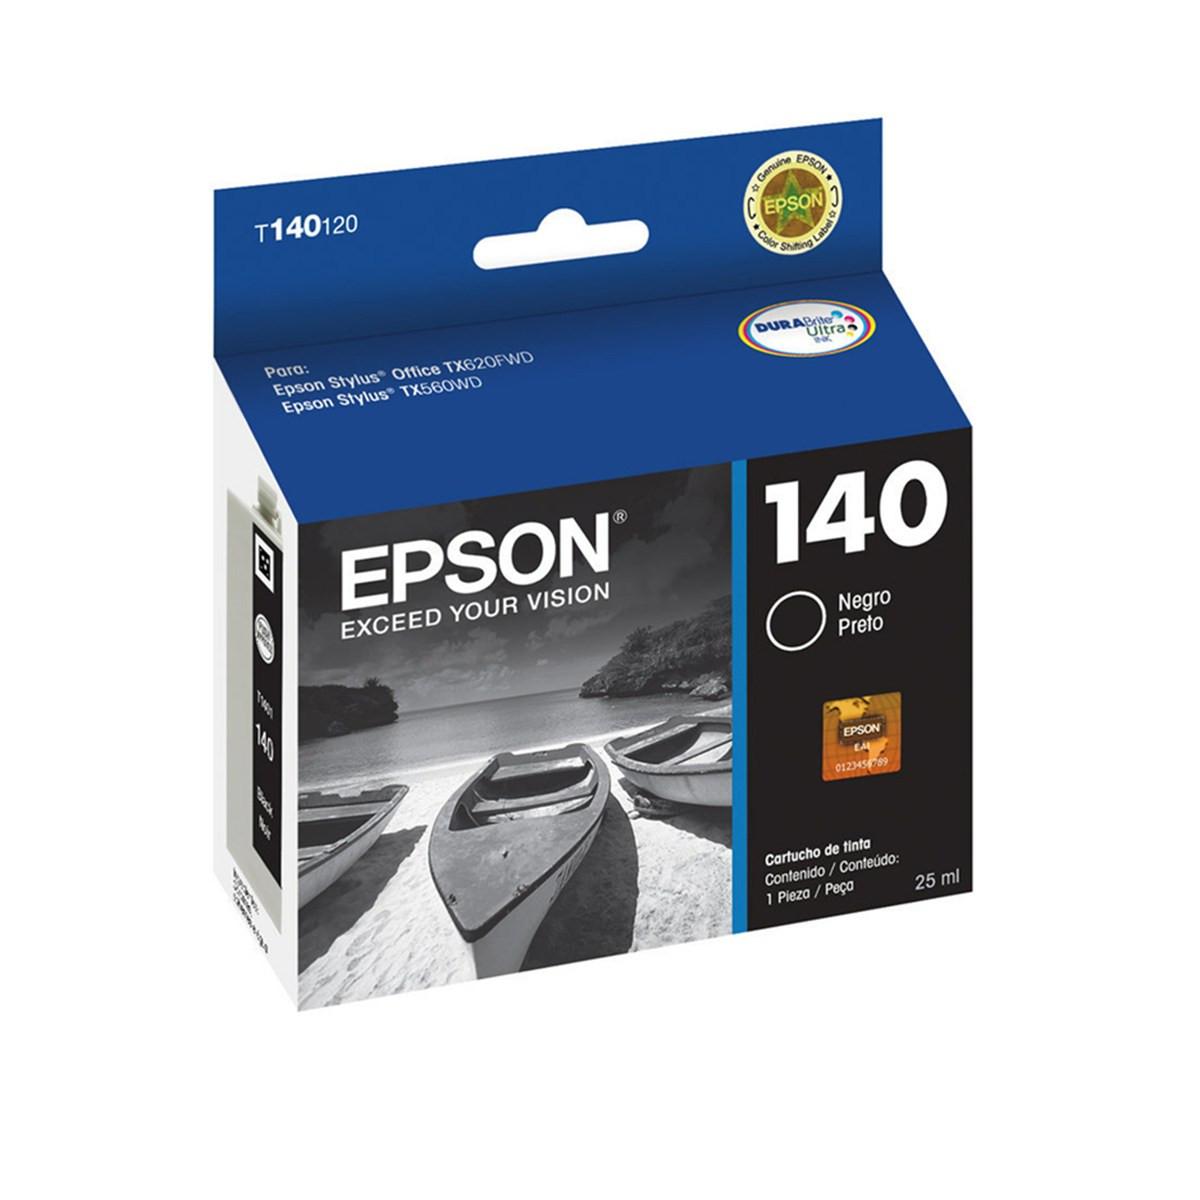 Cartucho de Tinta Epson T140120 T140 T1401 Preto | T42WD TX560WD TX620FWD | Original 25 ml